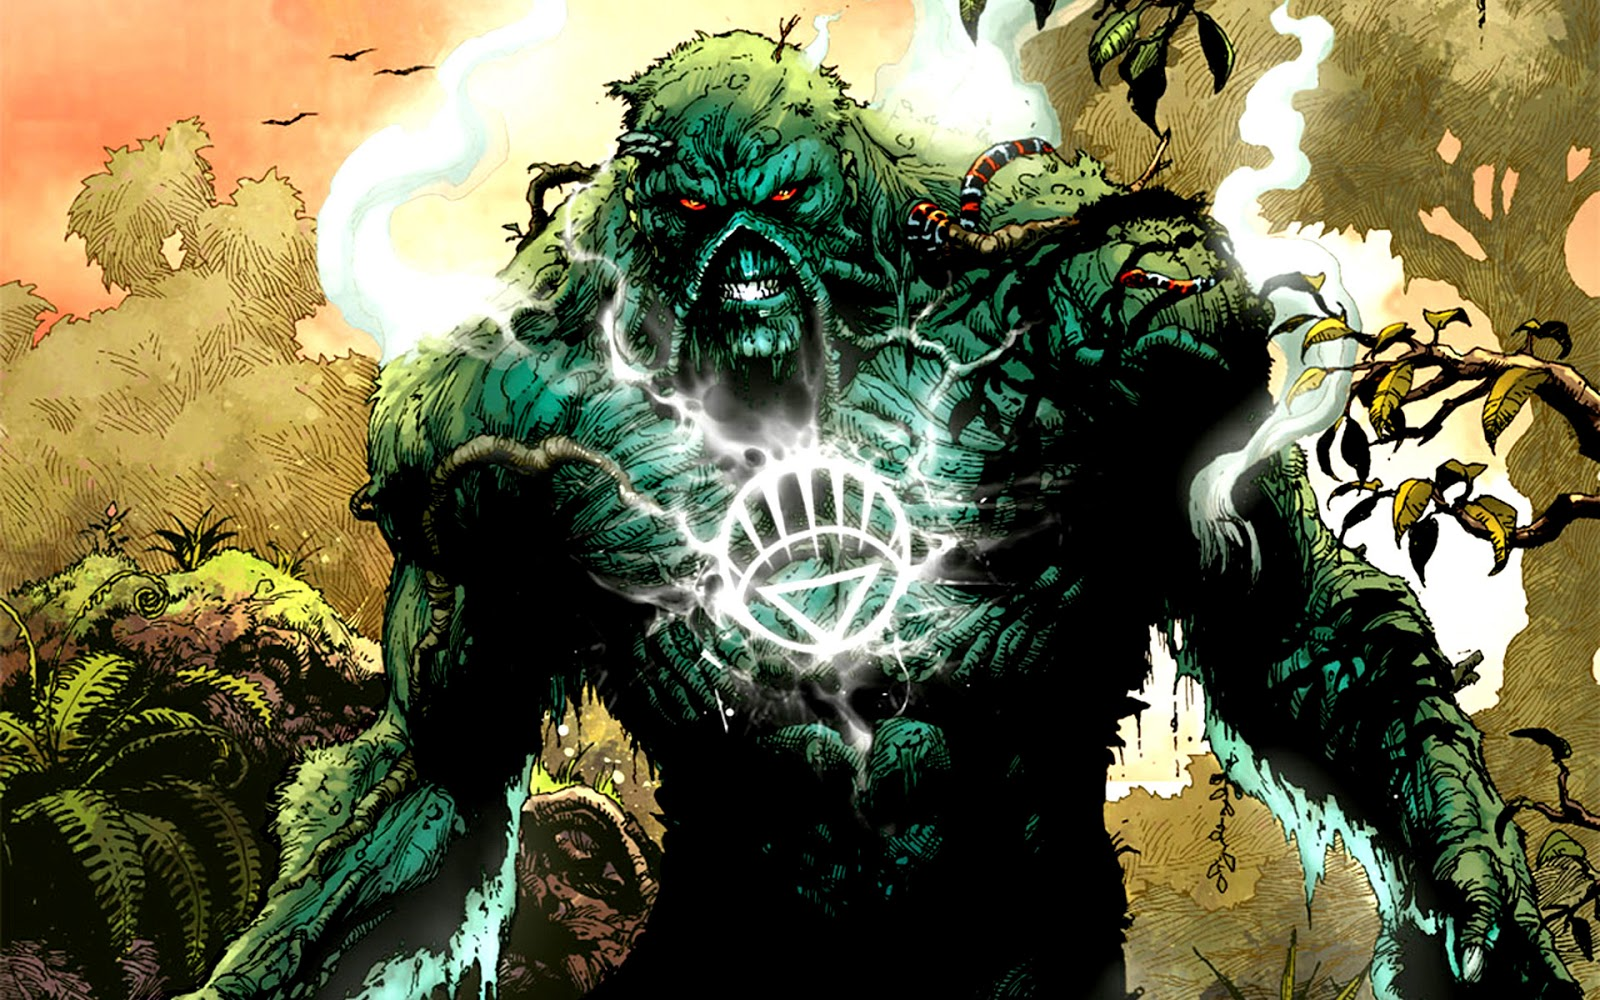 Swamp Thing - Comic Wallpaper 01.jpg